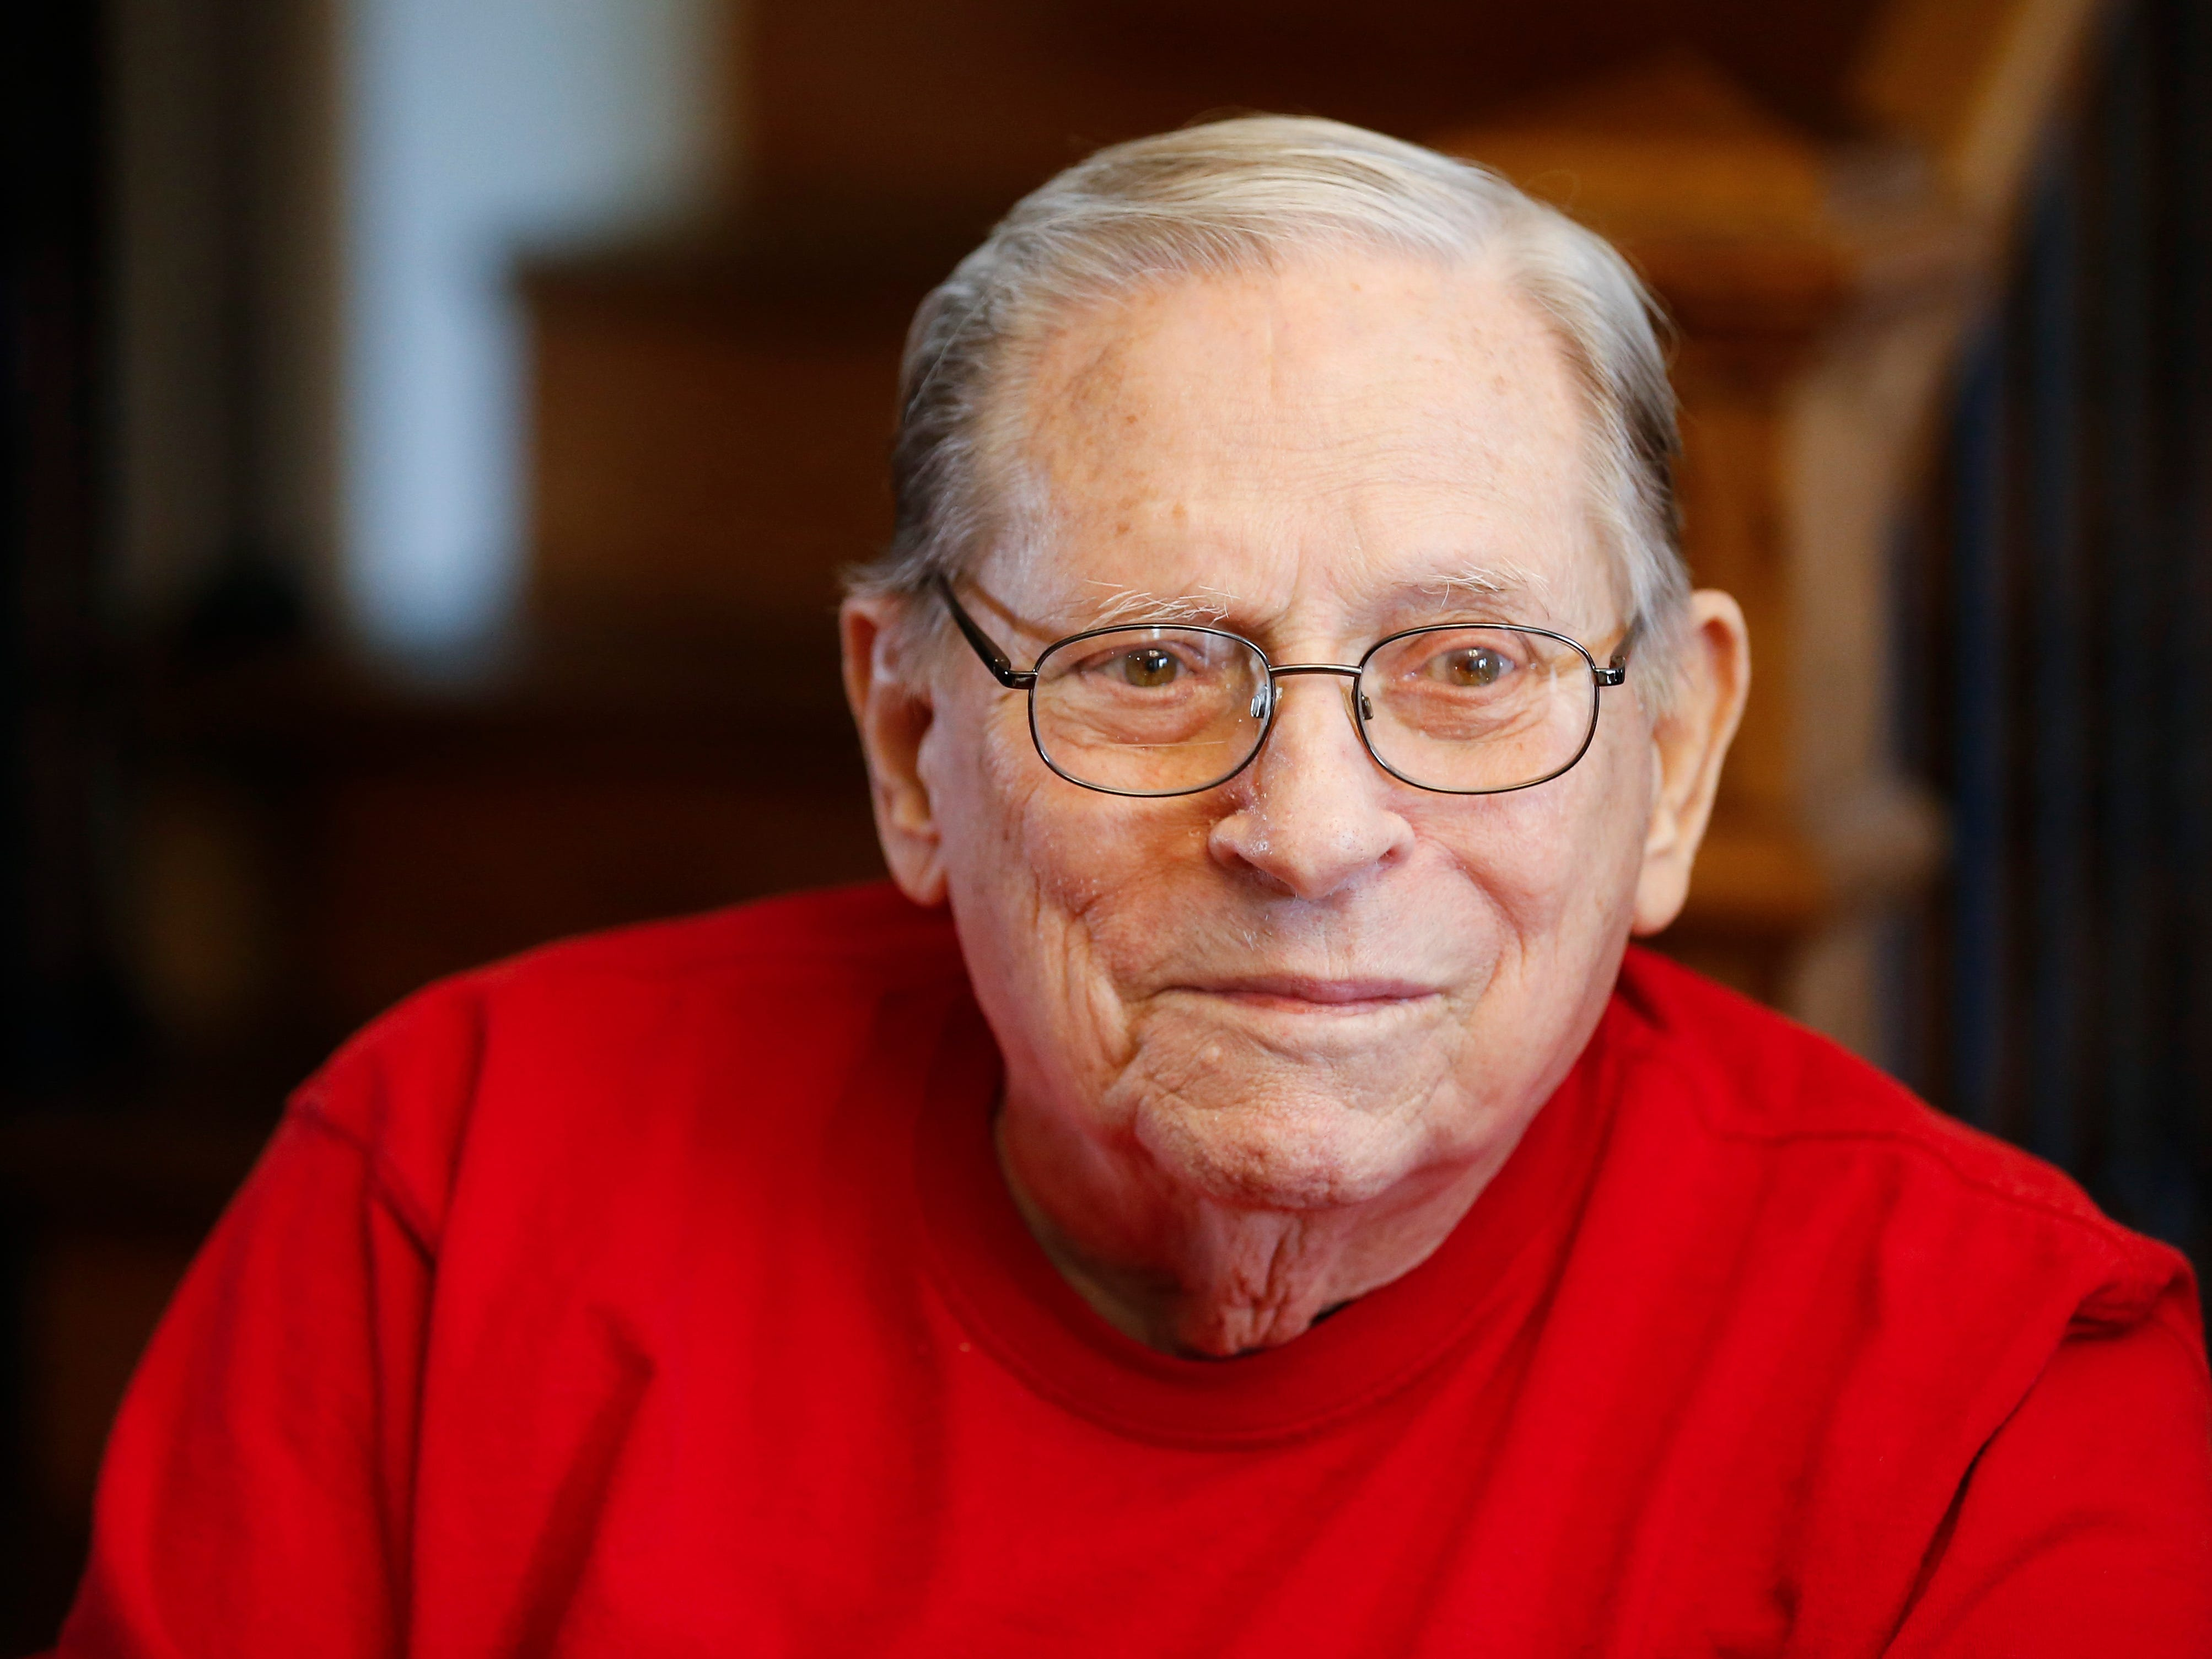 World War II veteran Donald Gundlach, 92.